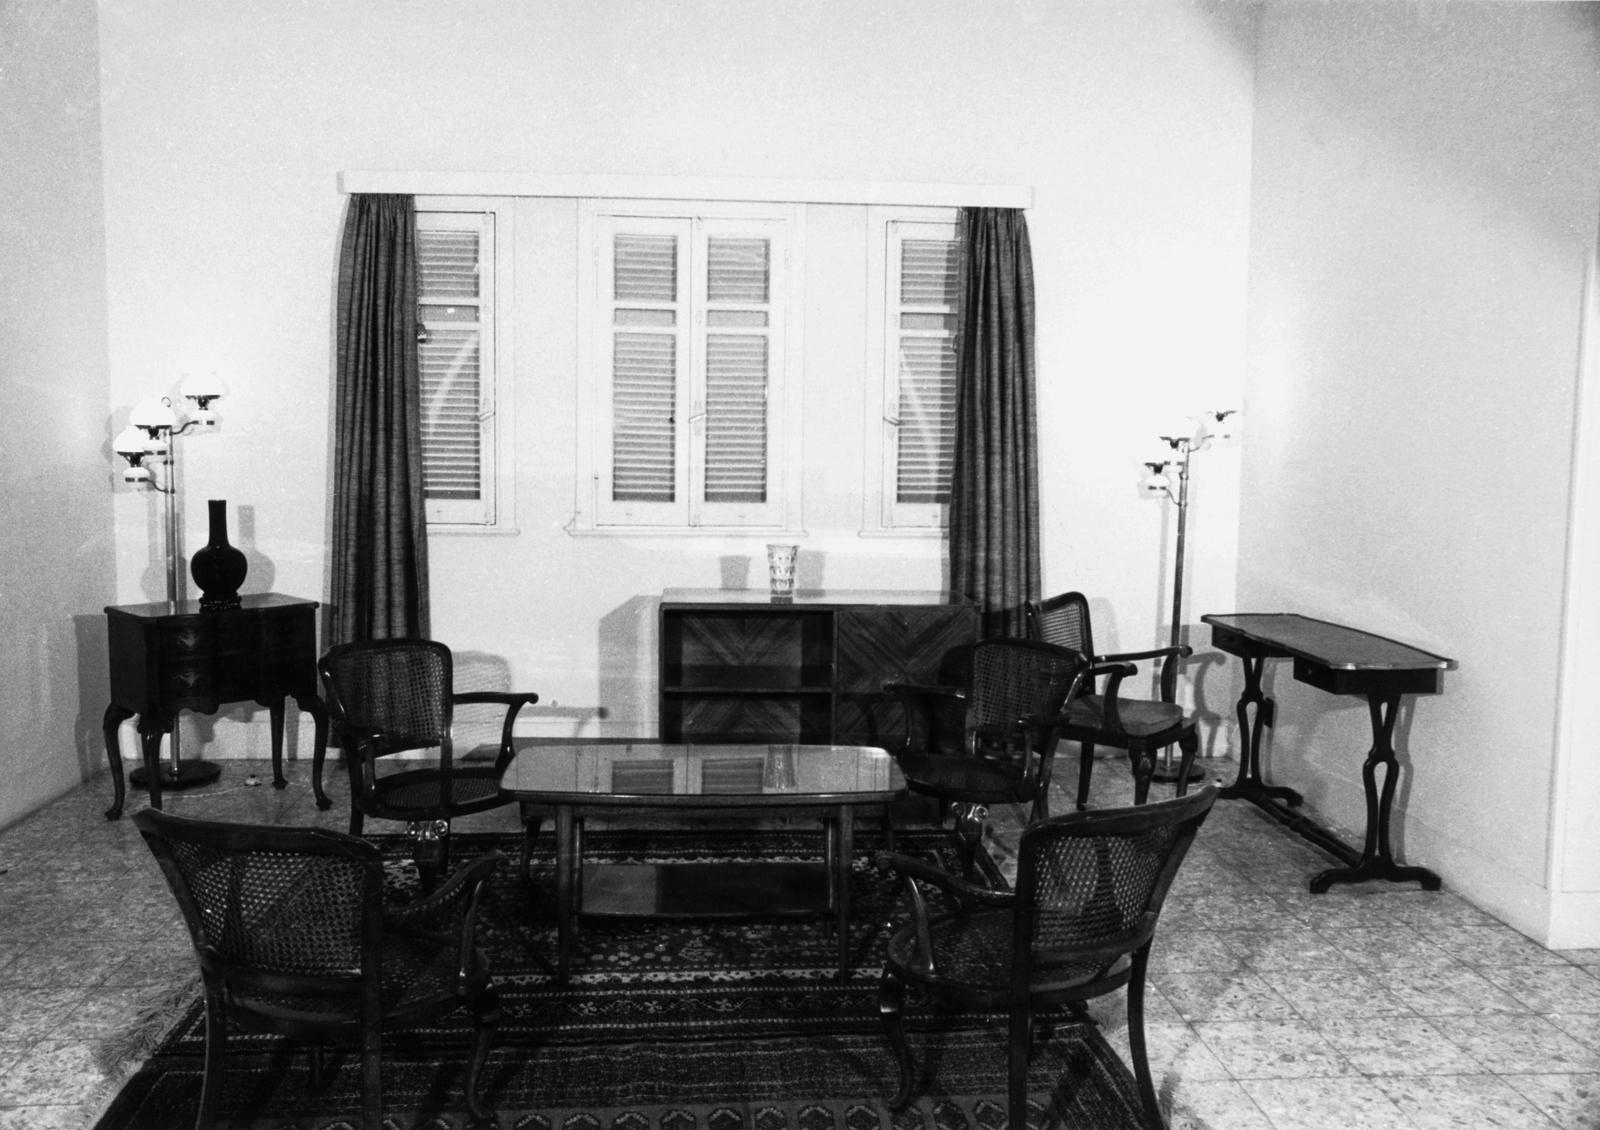 Cairo - Executive Level Position Residence - 1975